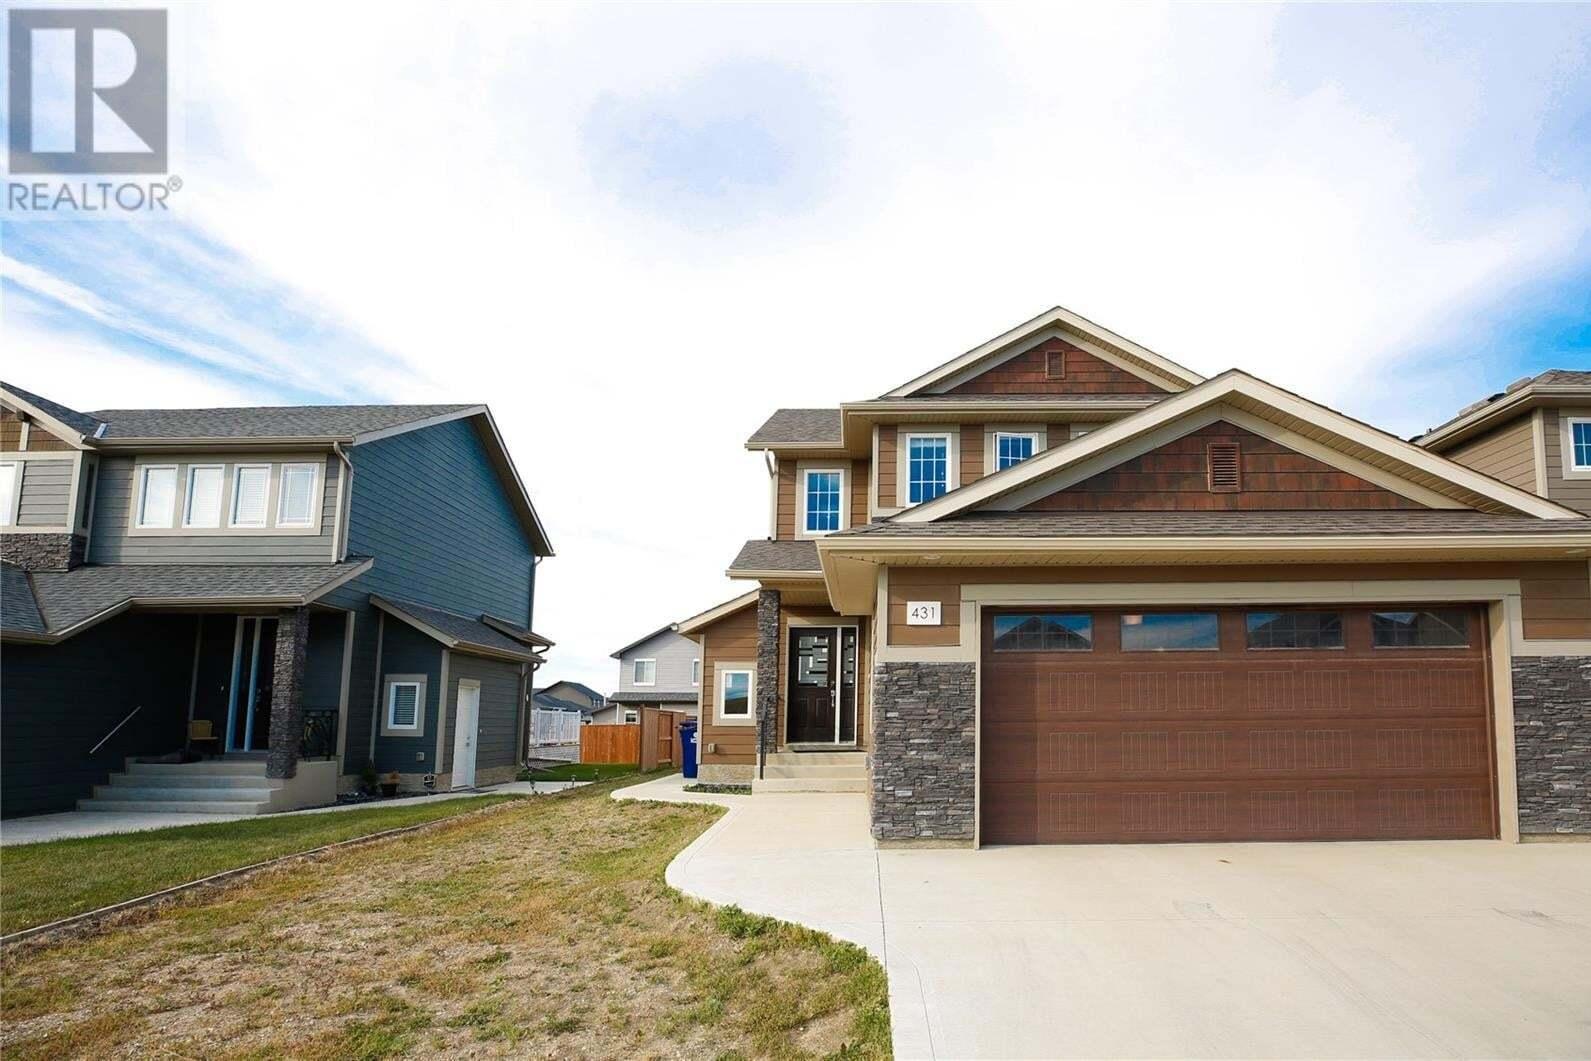 House for sale at 431 Pichler Cres Saskatoon Saskatchewan - MLS: SK821143